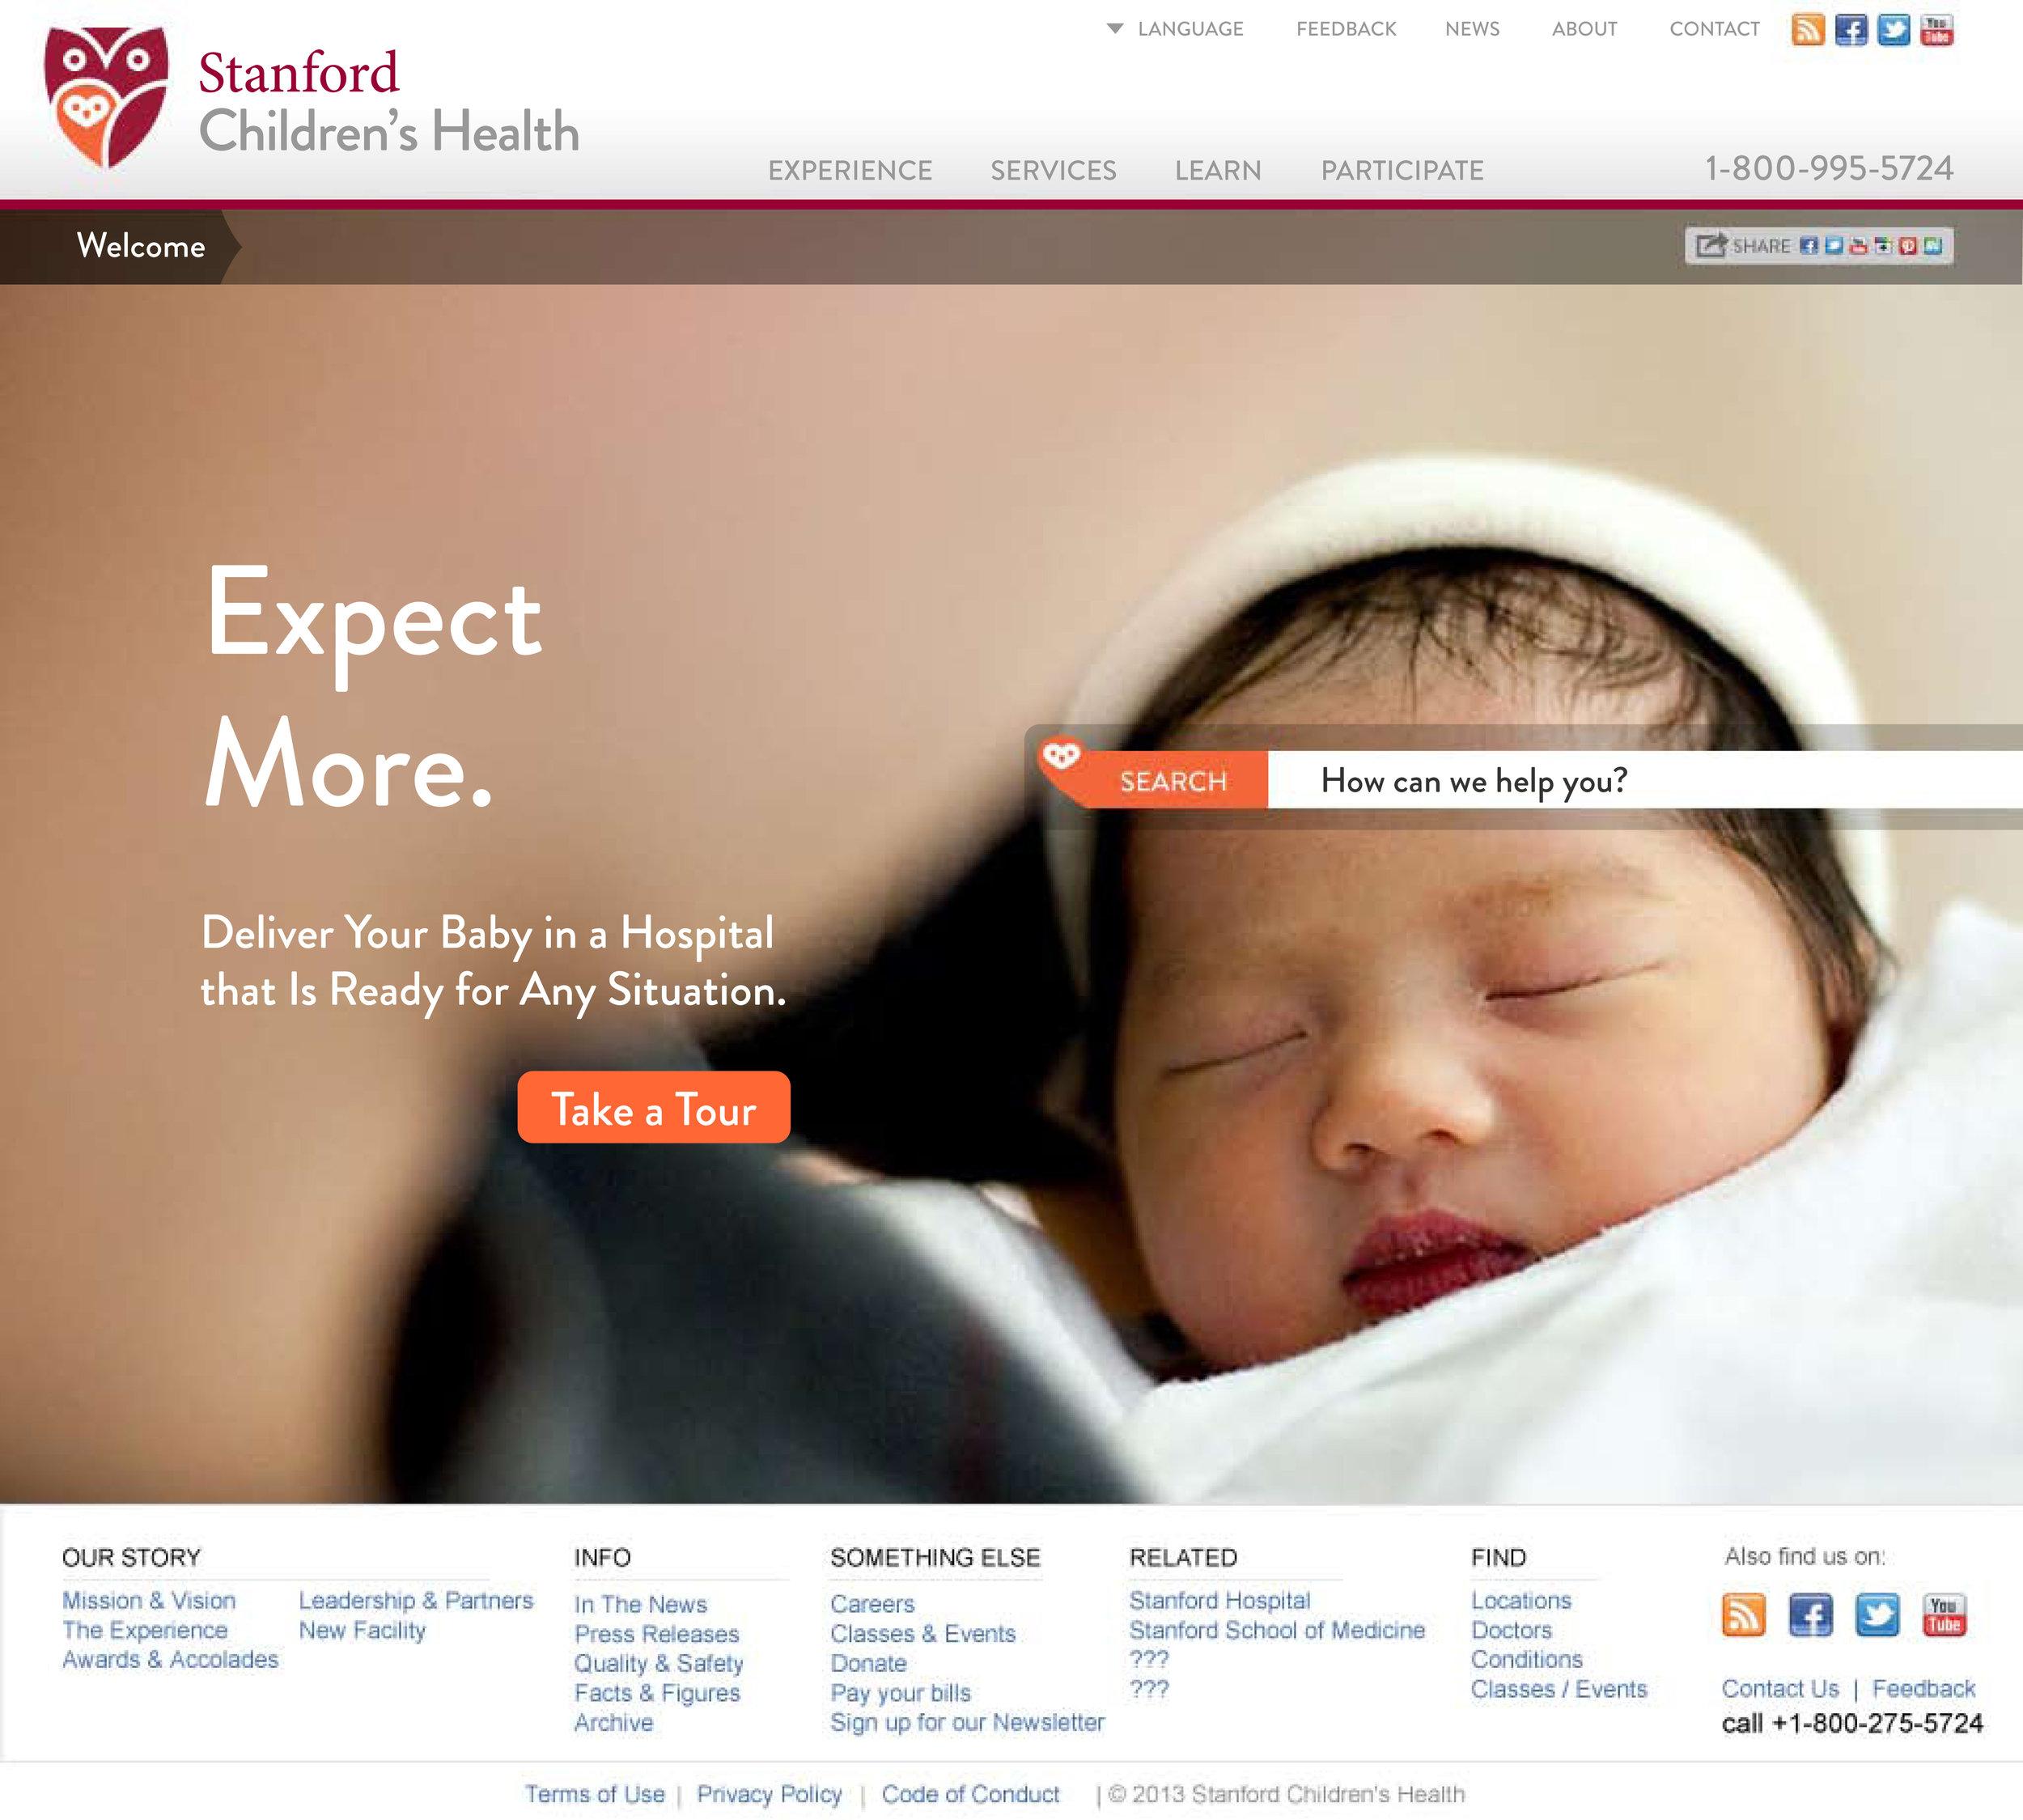 Stanford Children's Health Website Homepage Carousel